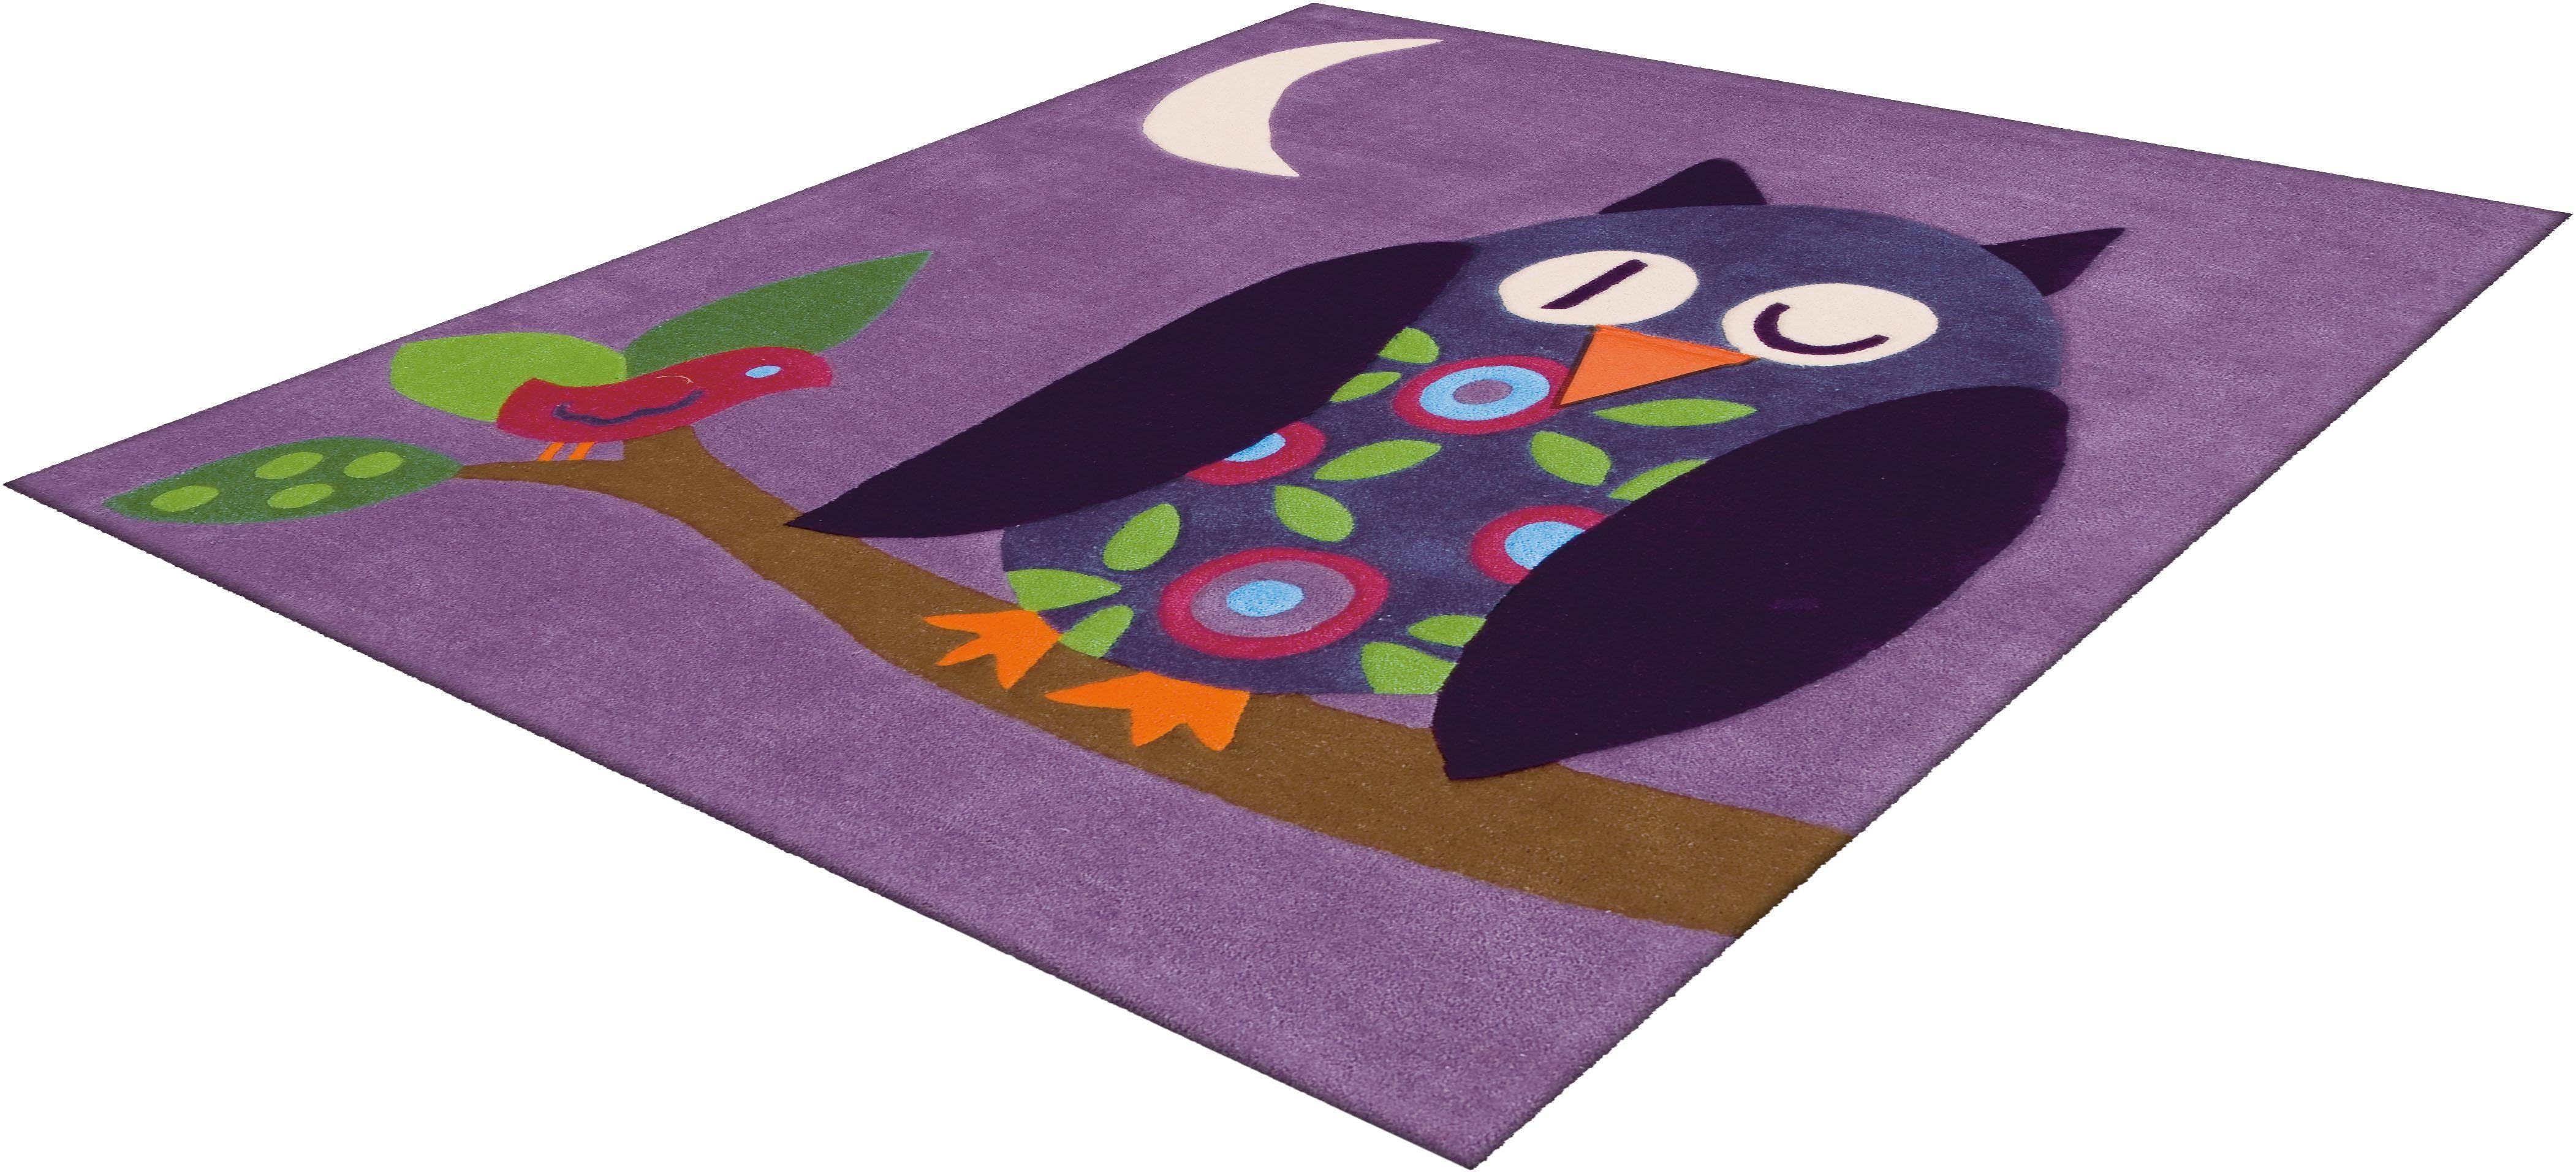 Kinderteppich »Joy 4049«, aRTE ESPINA, rechteckig, Höhe 16 mm